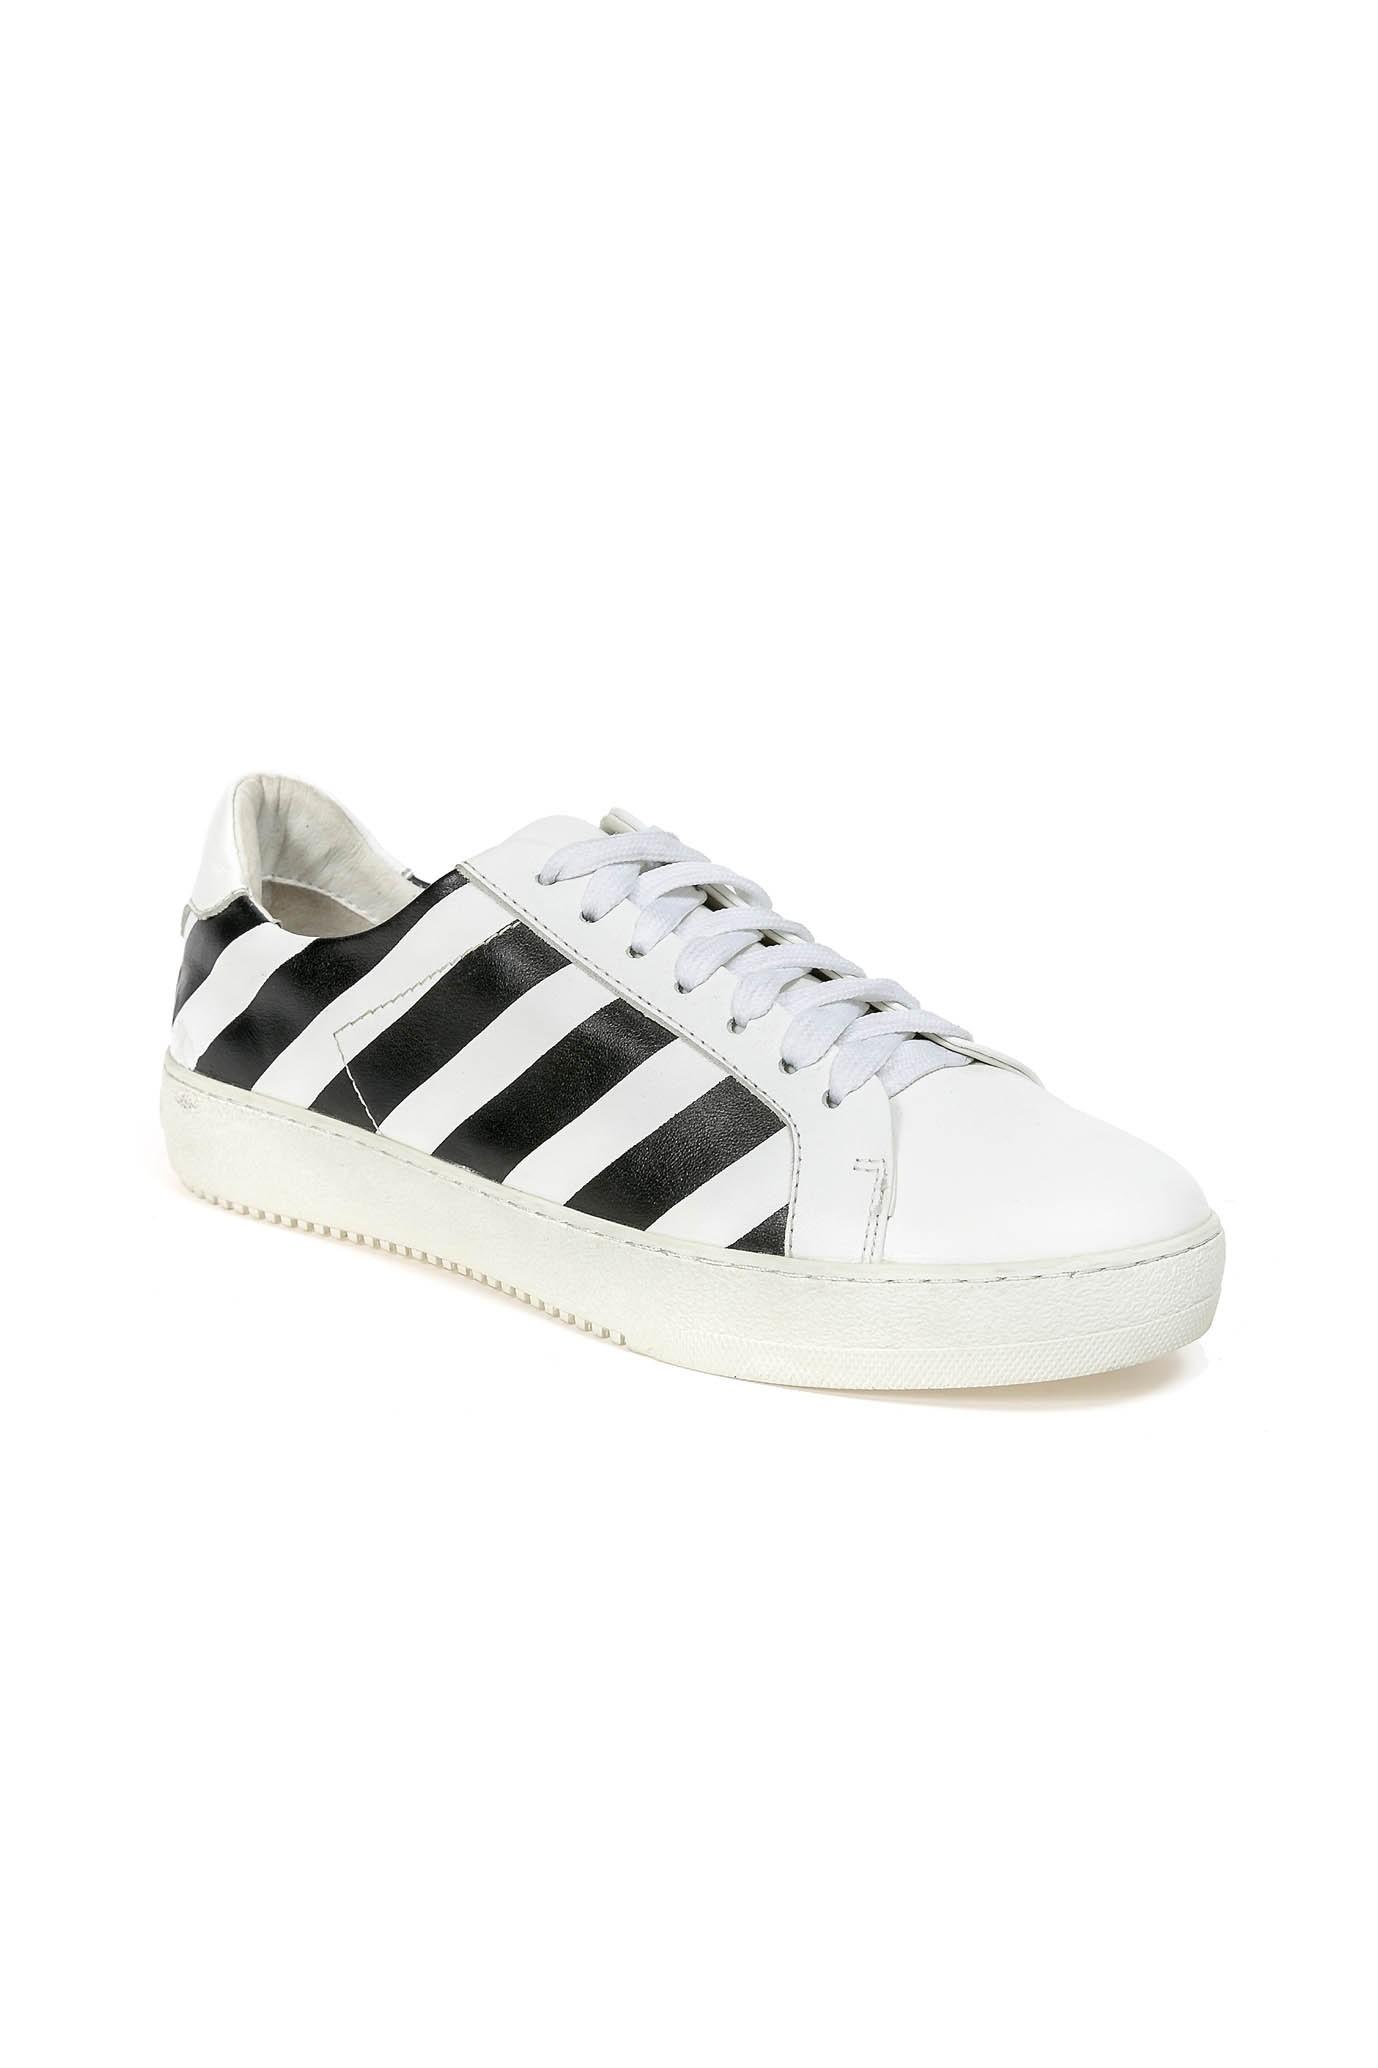 White and Black Sneakers BLACK STRIPE